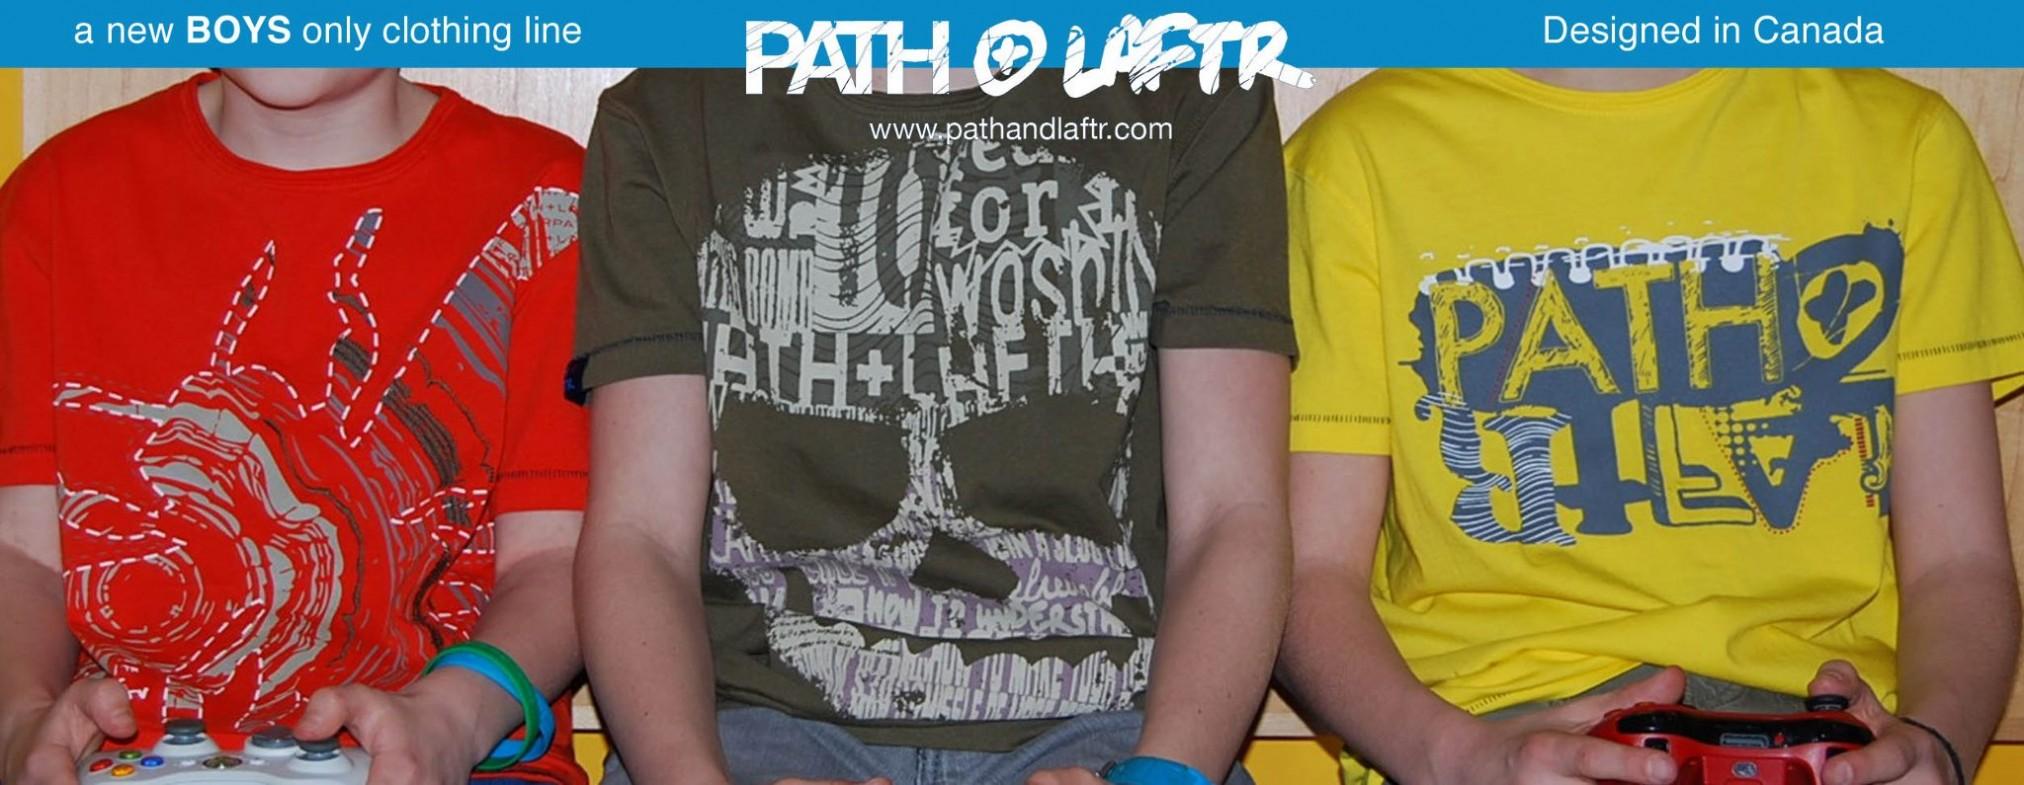 pathandlaftshirts